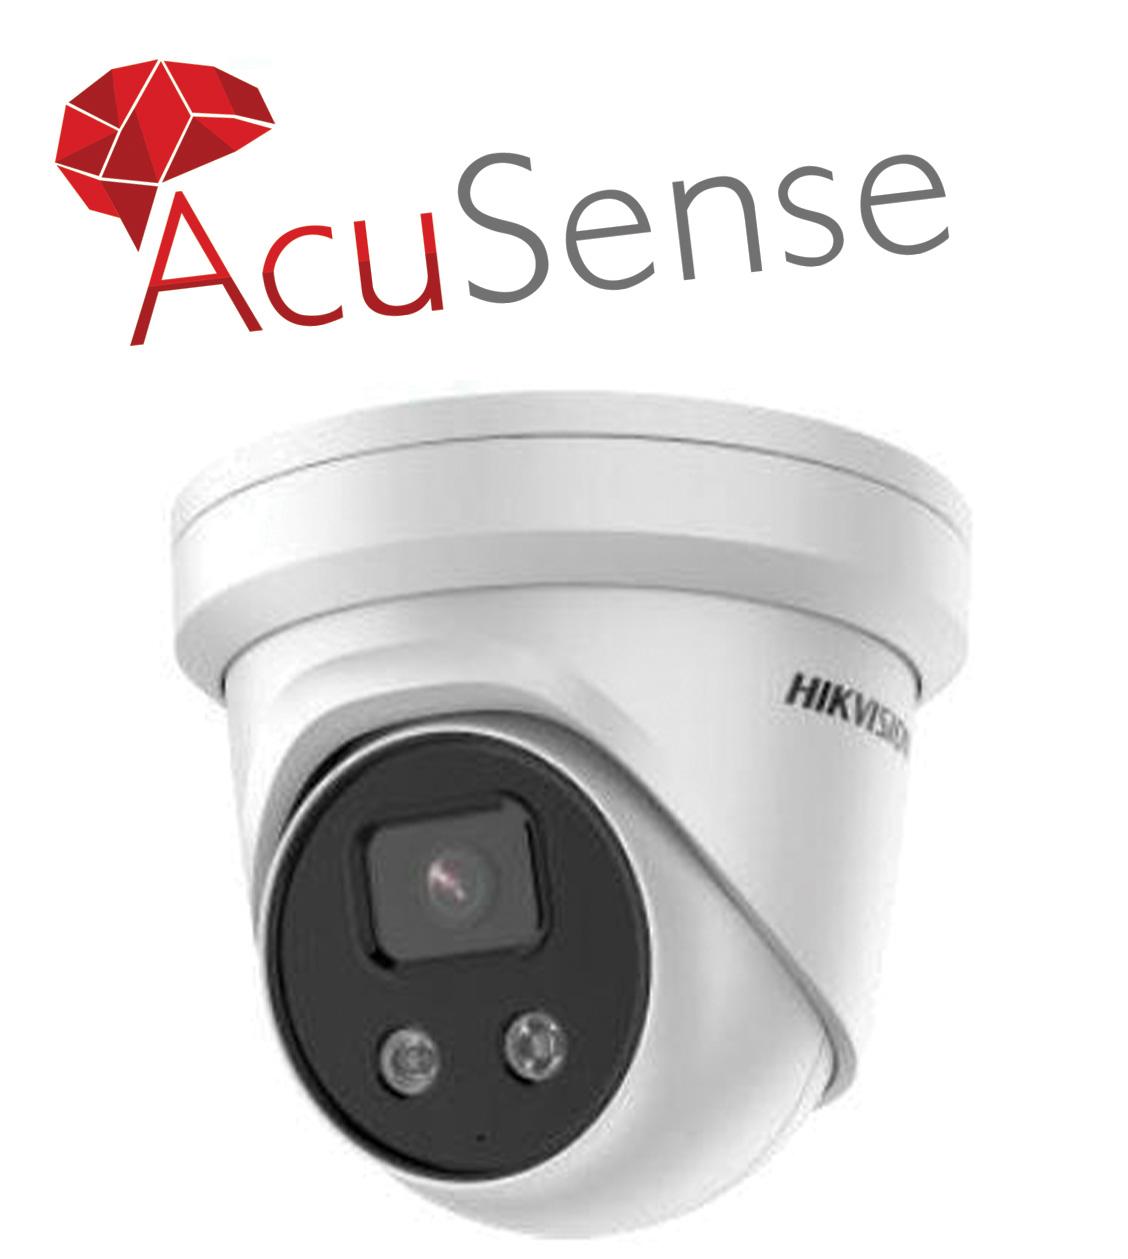 Hikvision-DS-2CD2346G2-I6mm-IP-Turret-Ueberwachung-Kamera.jpg